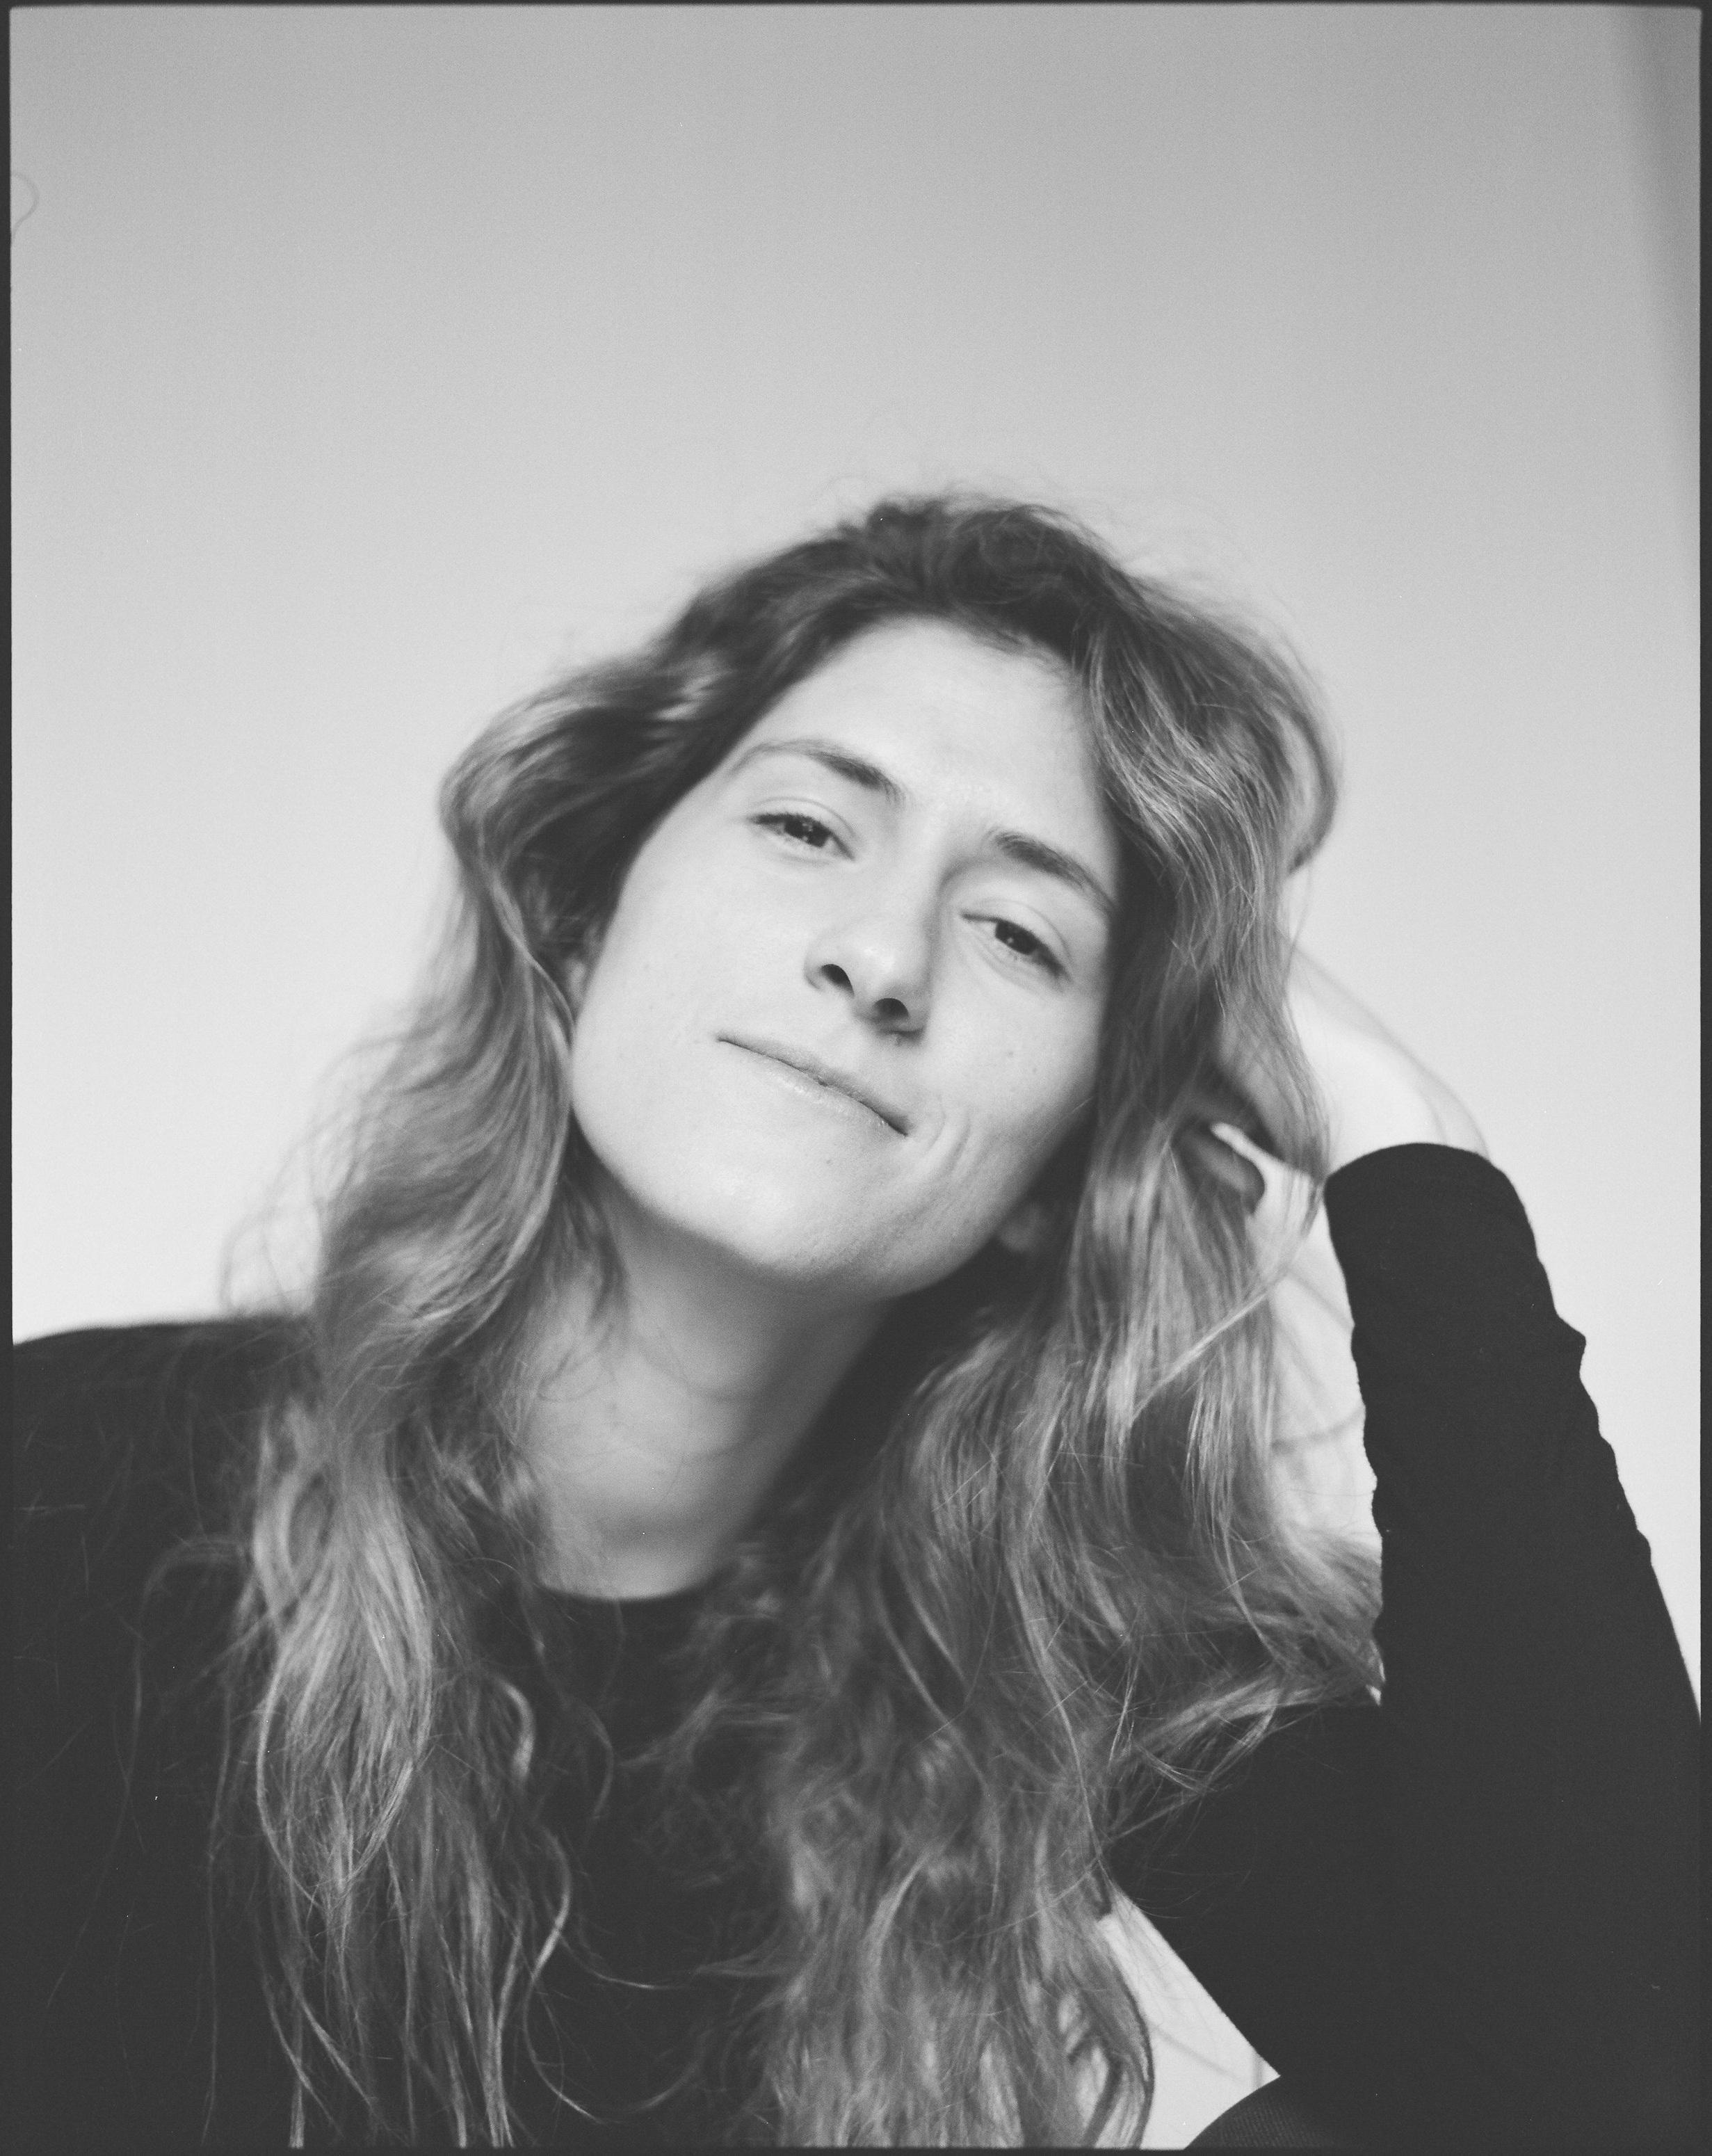 Victoria_Rivera_Portraits_Josefina_Santos-9.jpg